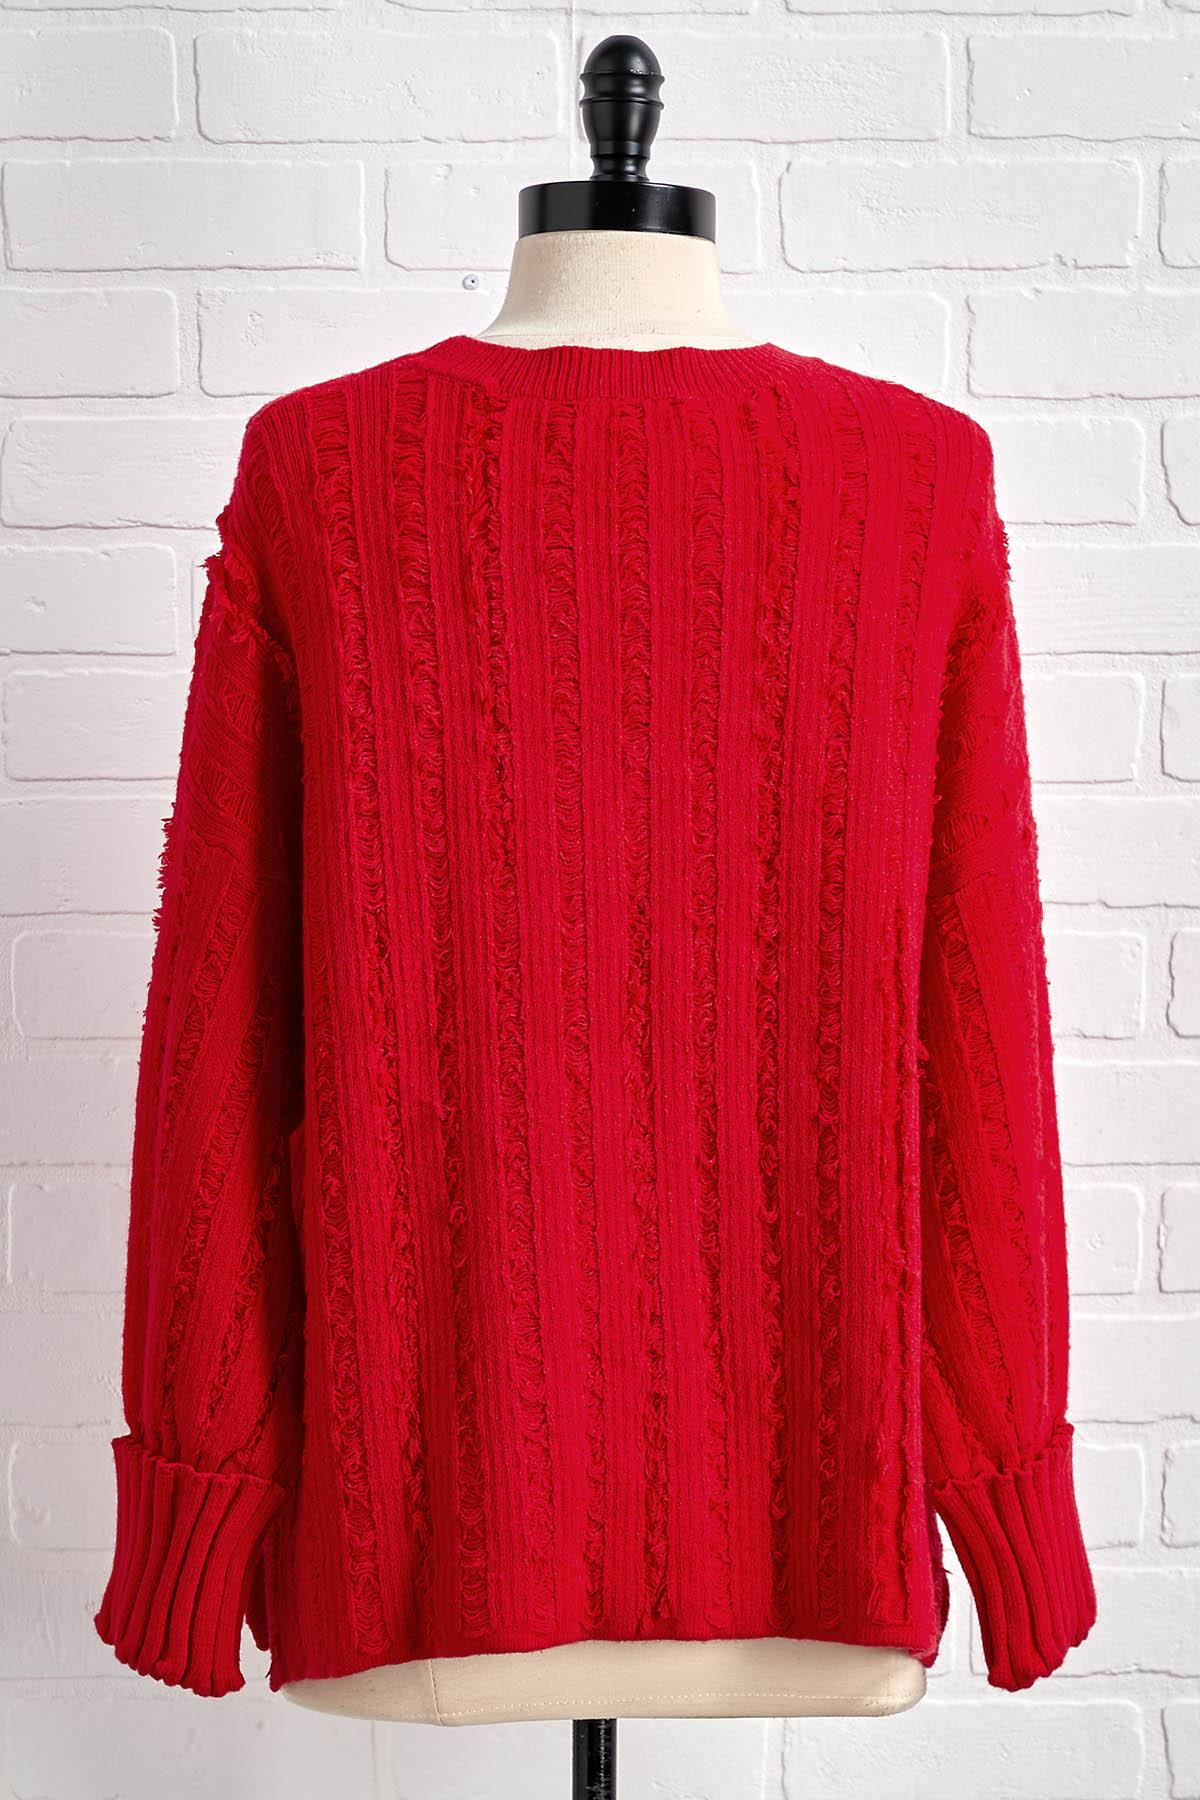 Jingle Bell Rock Sweater